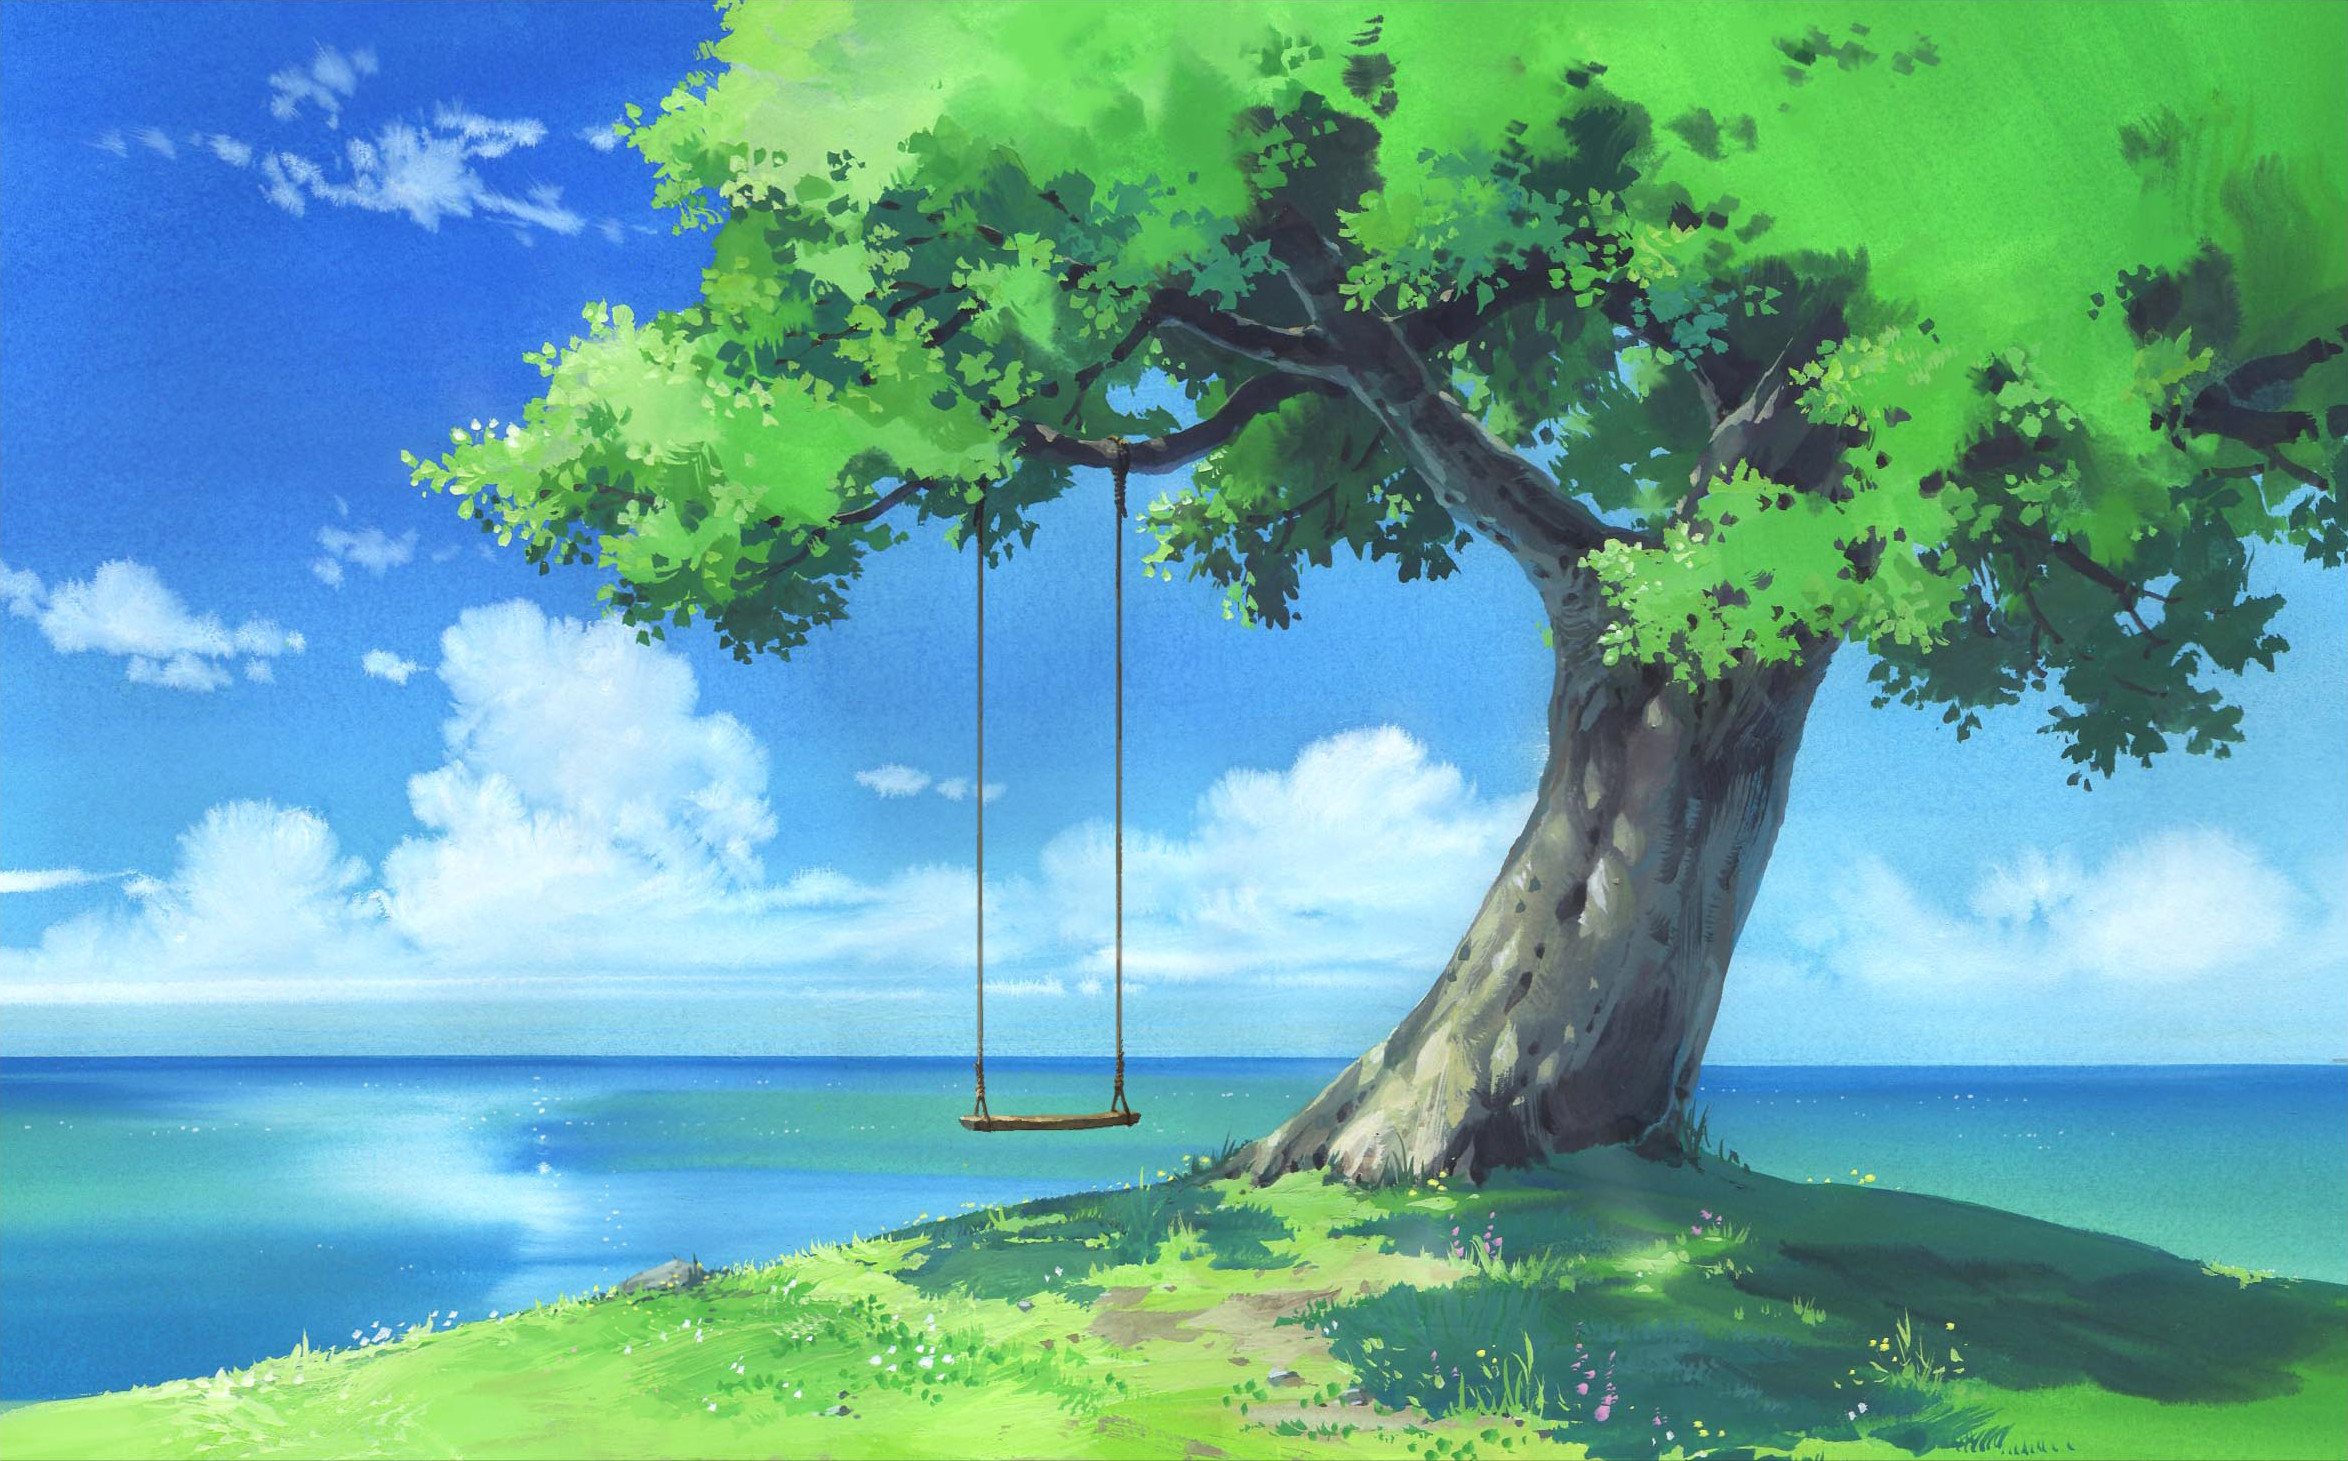 Landscape Anime Scenery Wallpaper 4k